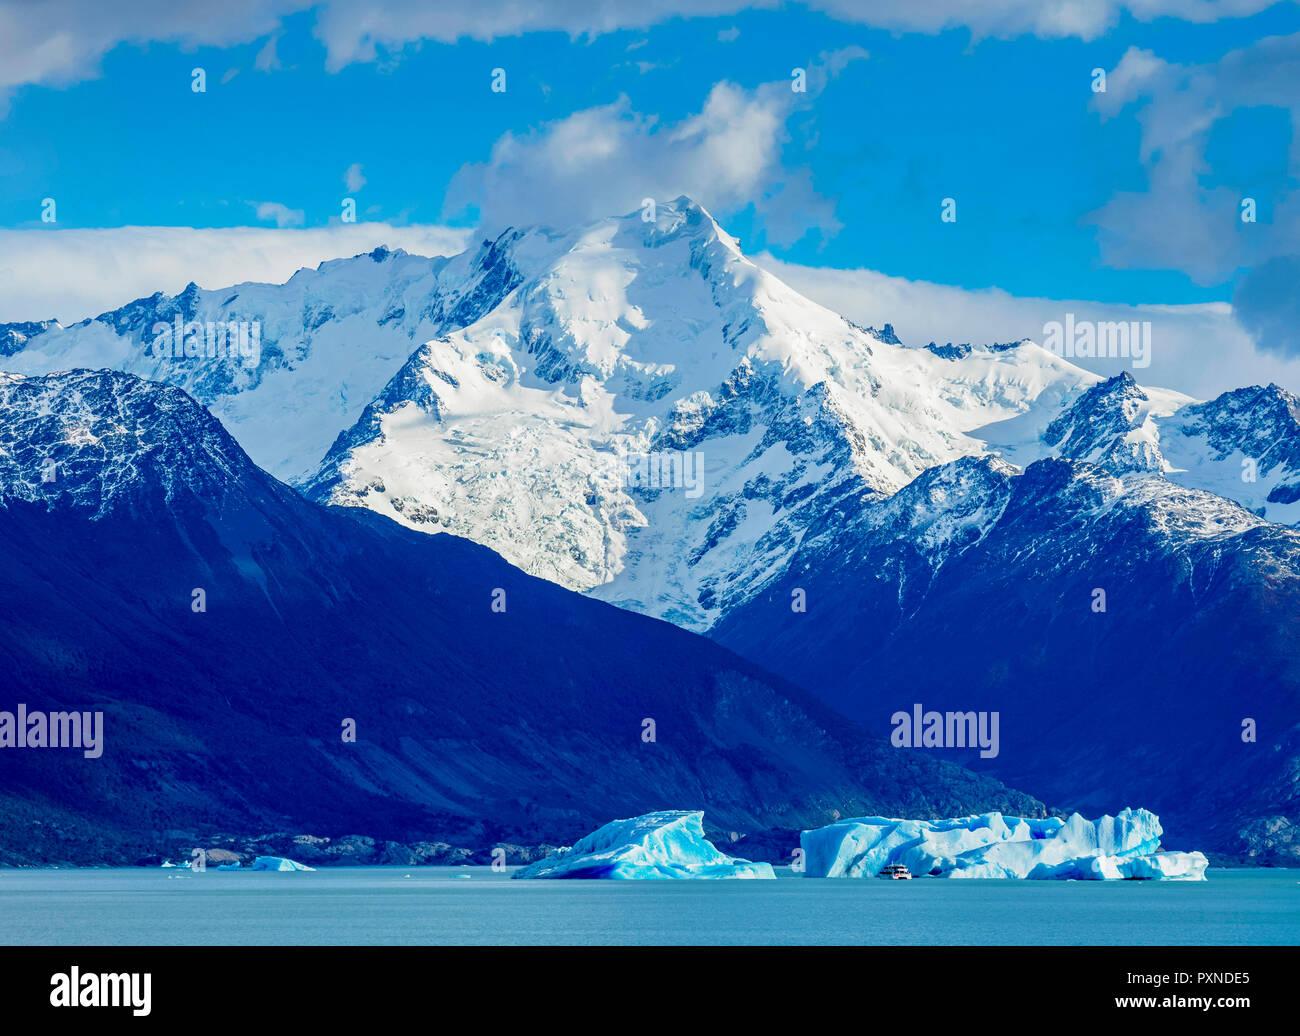 Icebergs on Lake Argentino, Los Glaciares National Park, Santa Cruz Province, Patagonia, Argentina - Stock Image